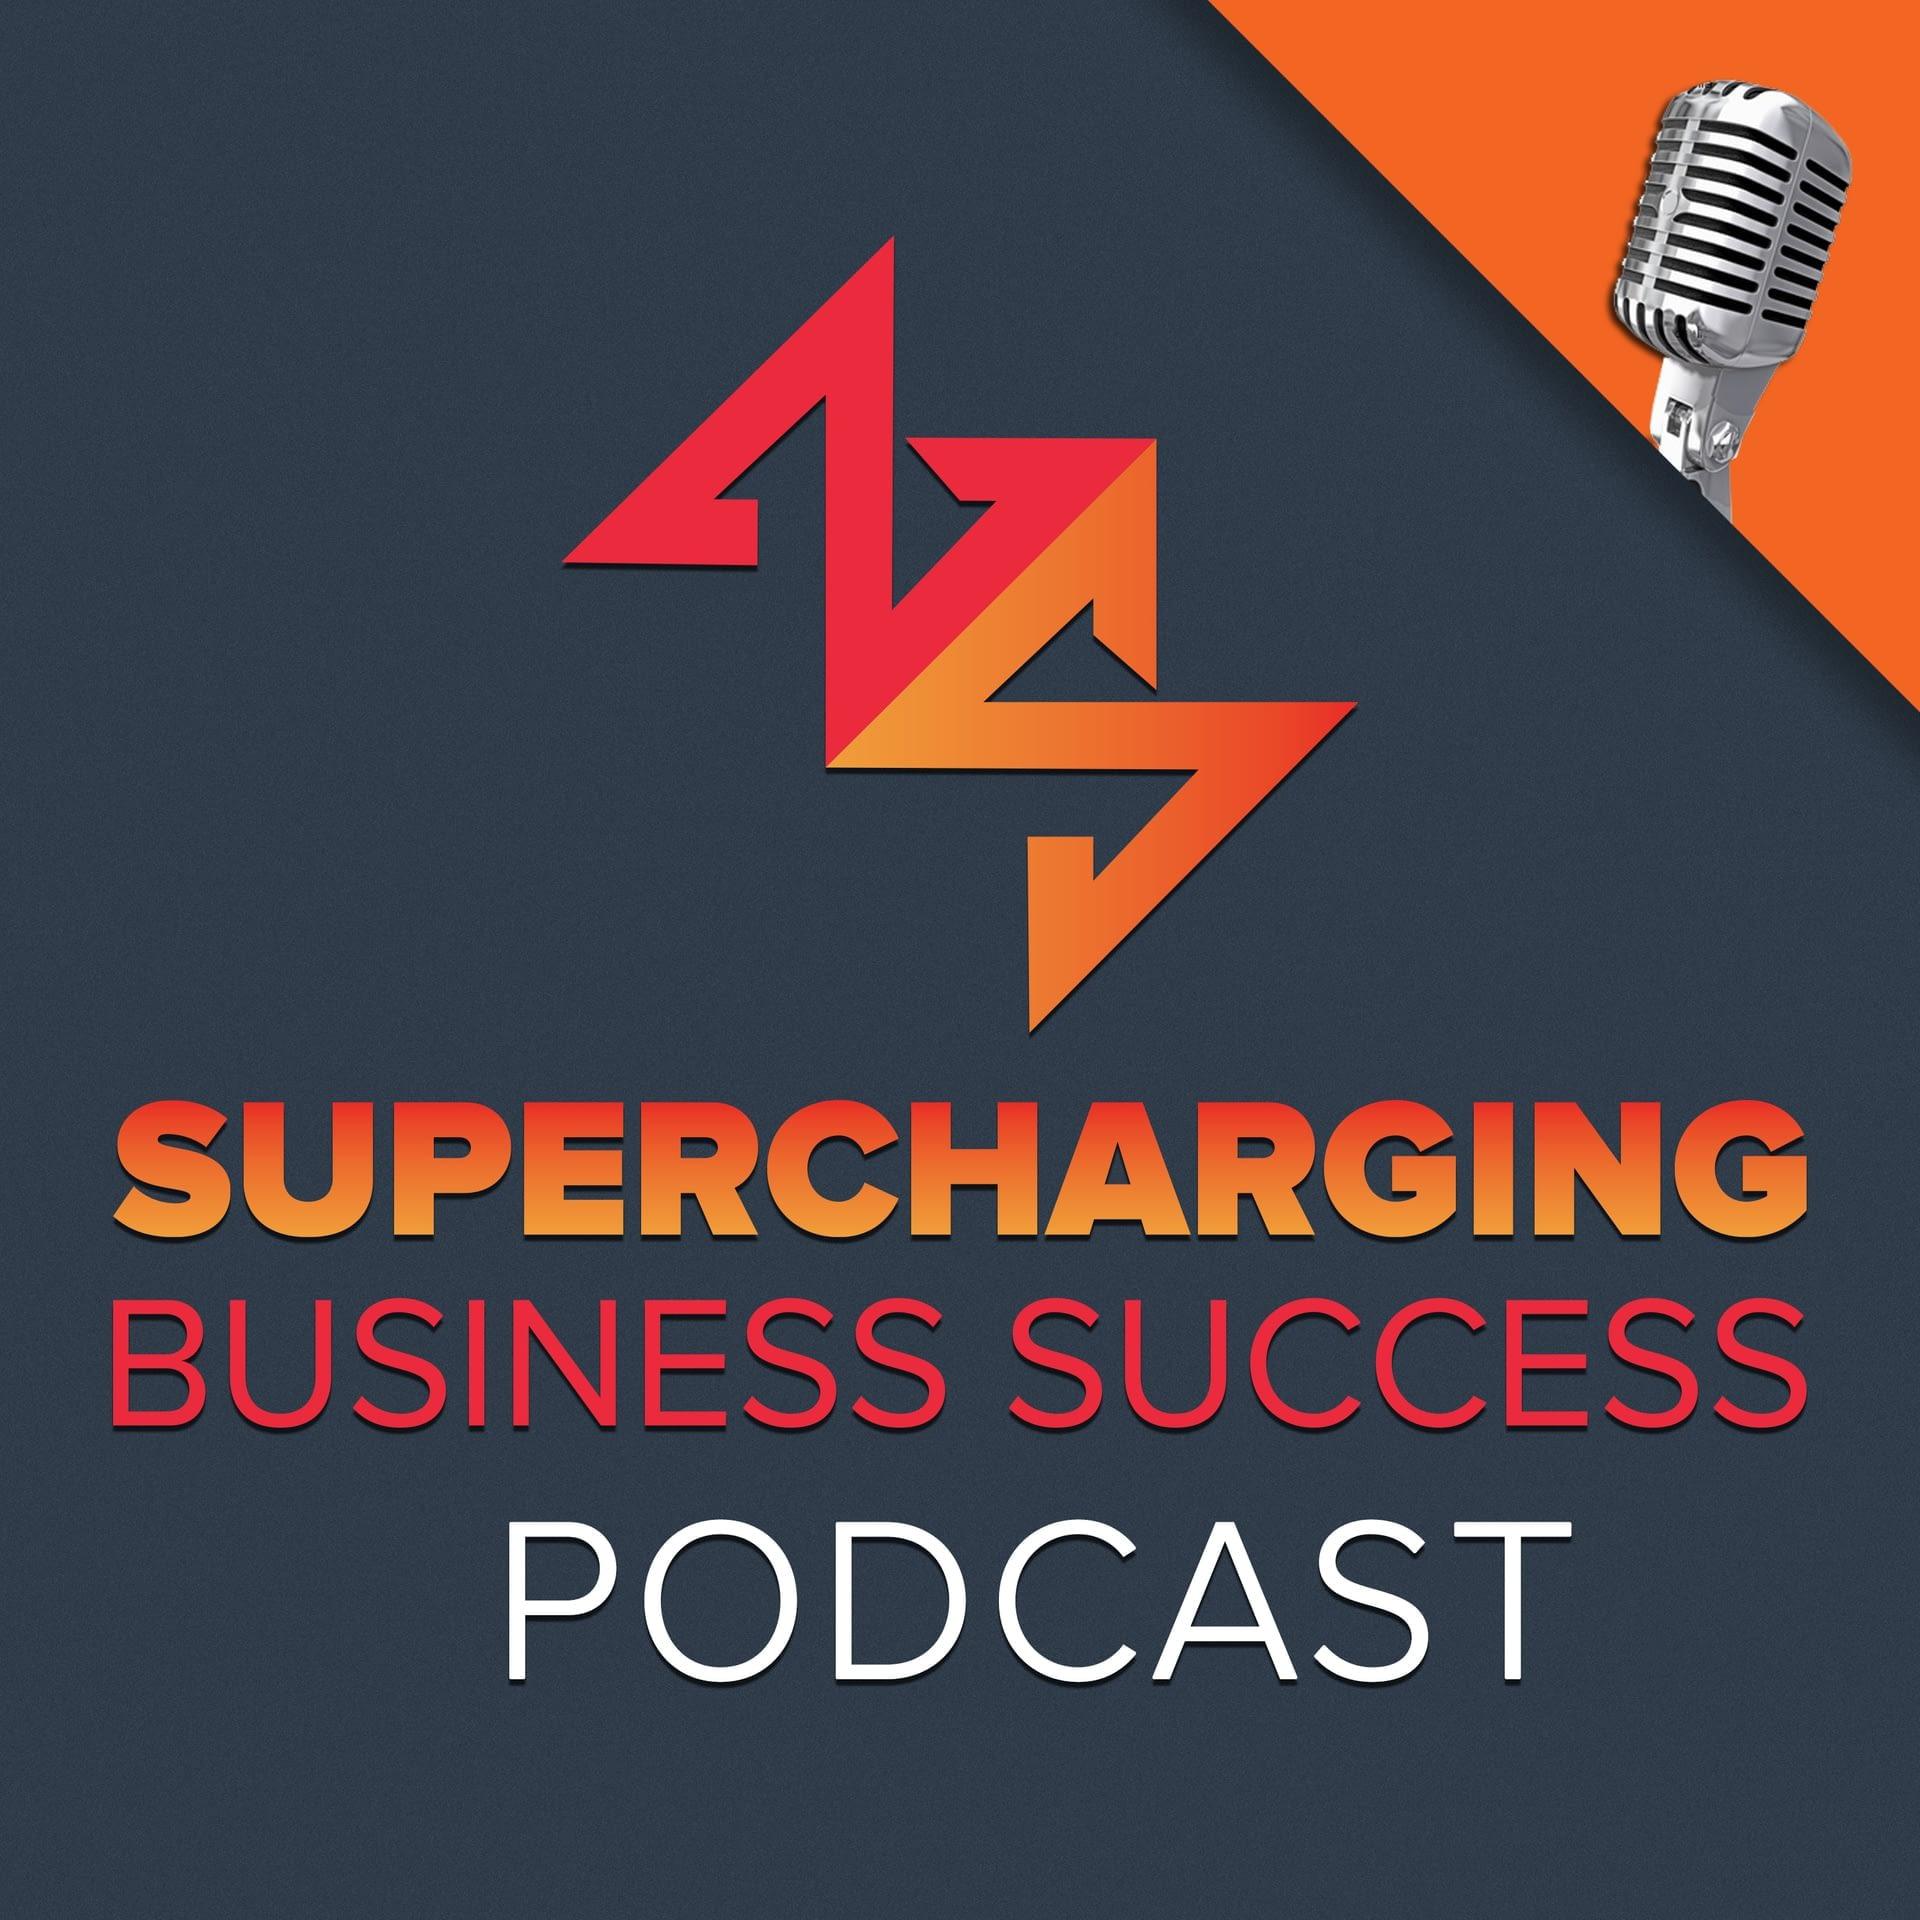 Supercharging Business Success